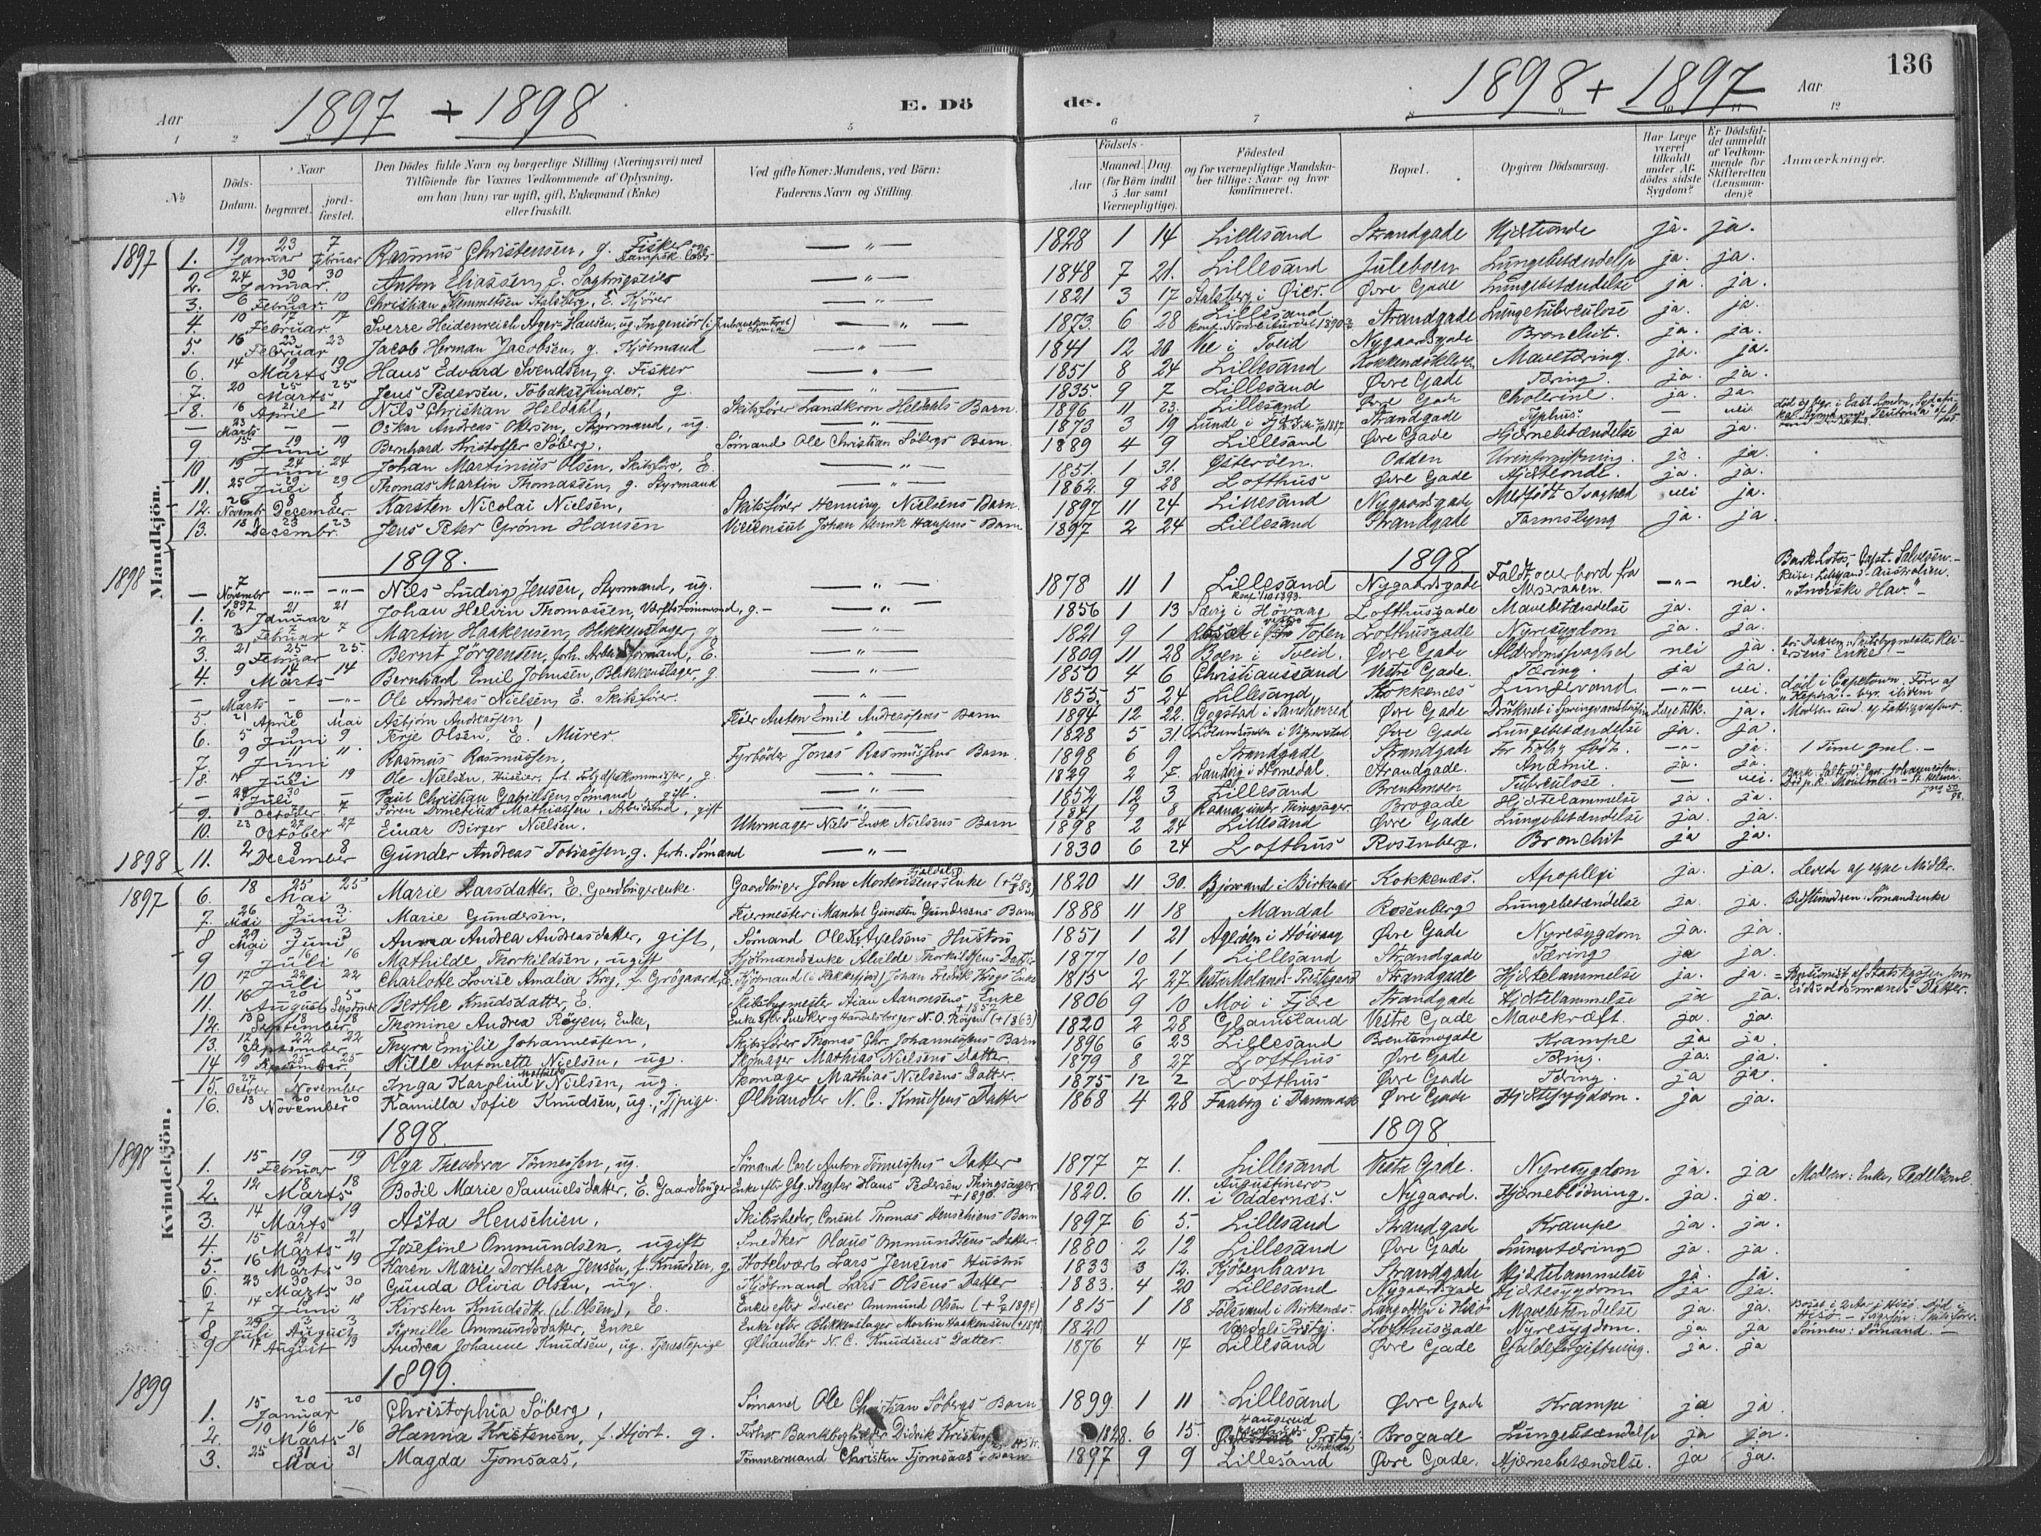 SAK, Vestre Moland sokneprestkontor, F/Fa/Faa/L0001: Ministerialbok nr. A 1, 1884-1899, s. 136